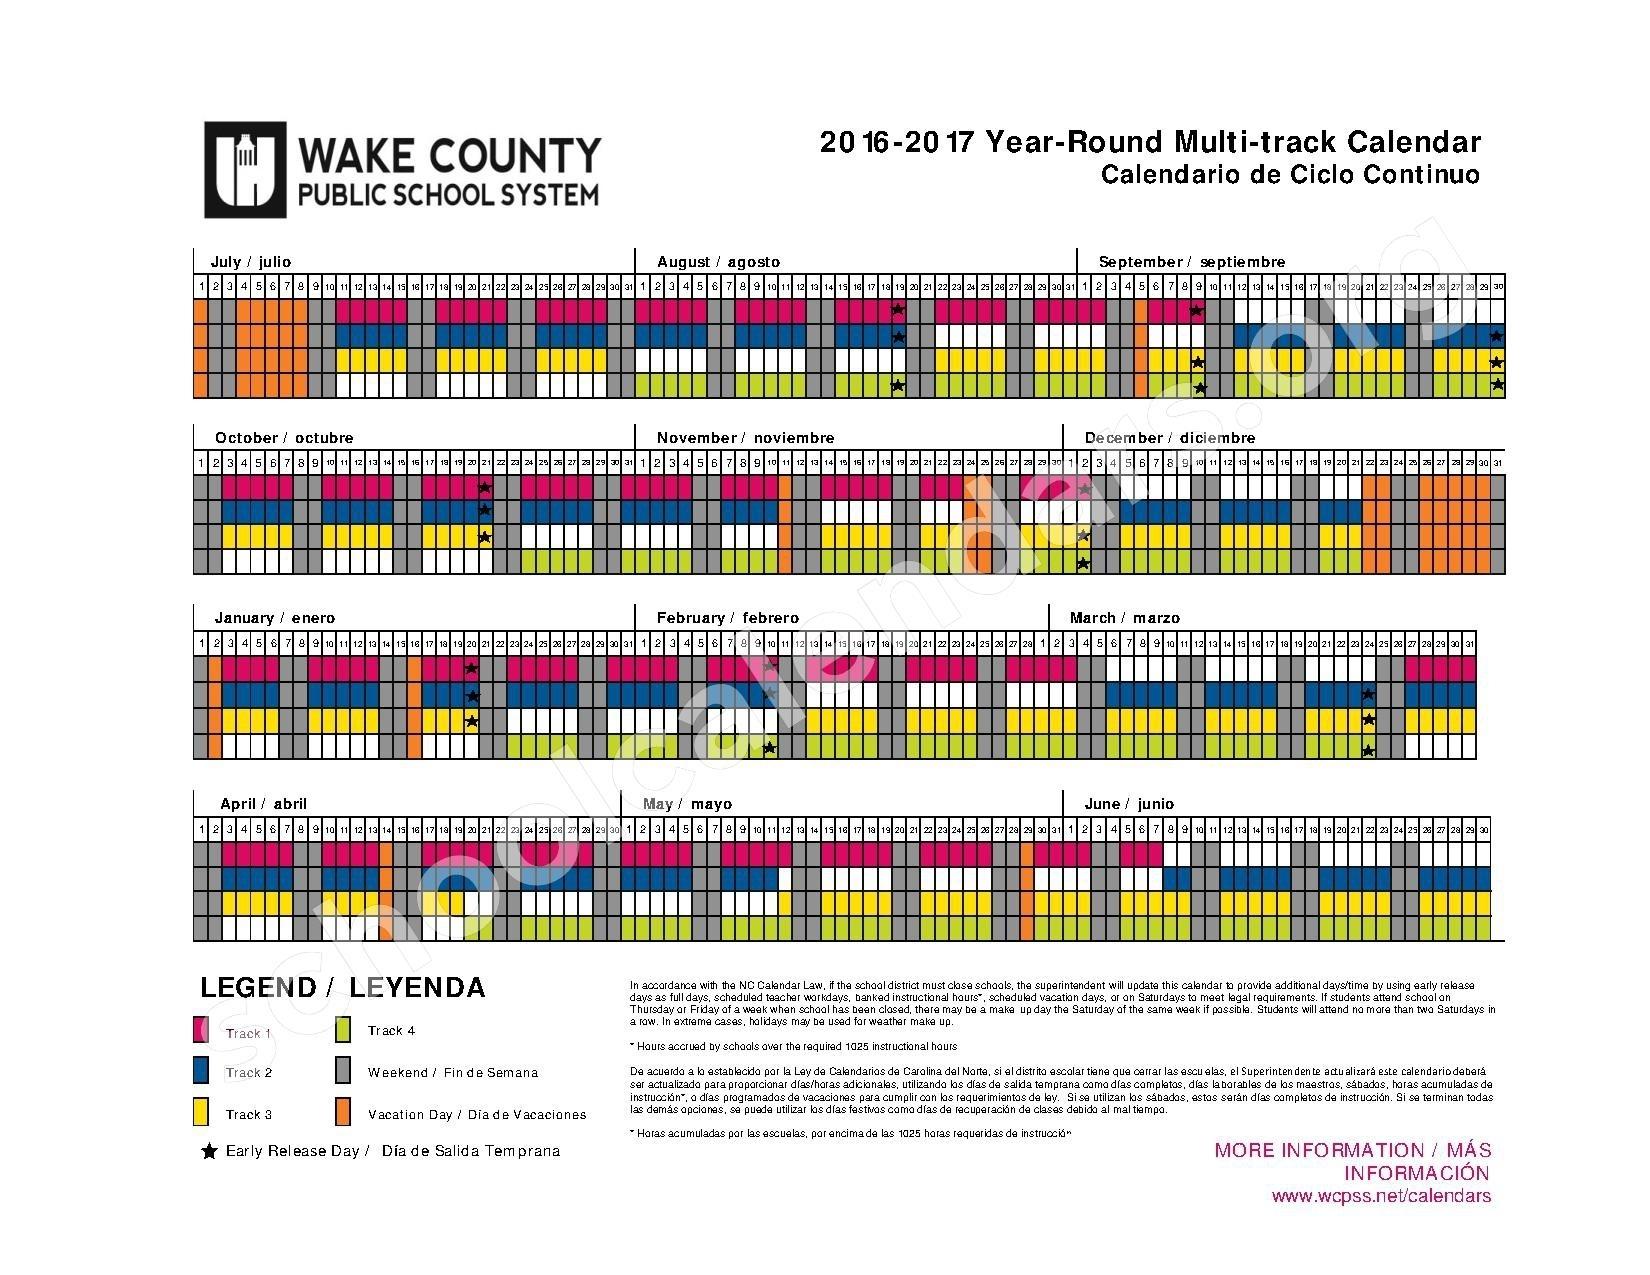 Wake County Year Round Calendar Calendar Pro